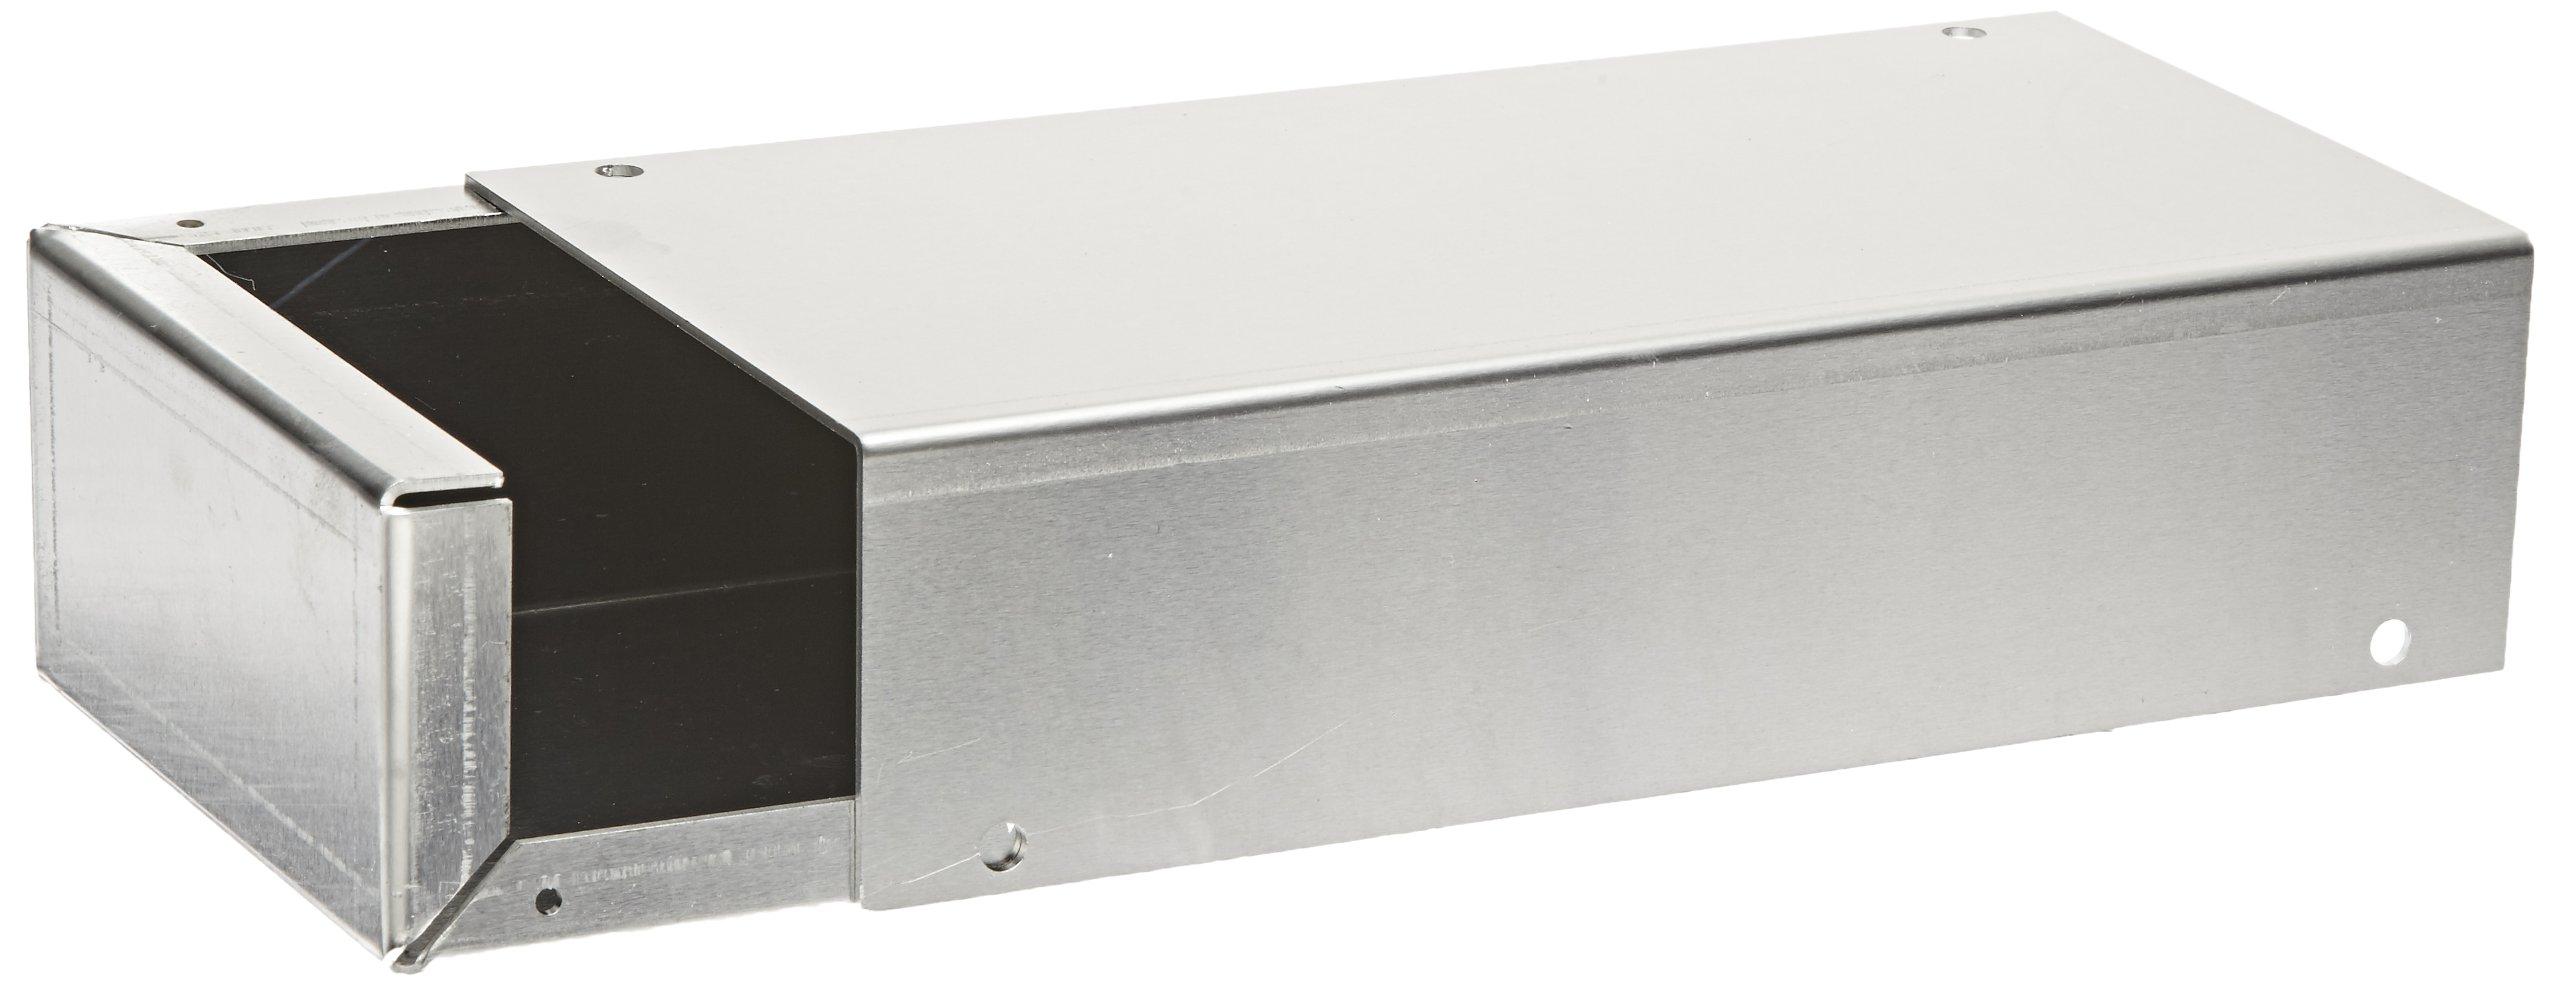 BUD Industries CU-482-A Aluminum Converter Box, 8'' Width x 2 Height x 4'' Depth, Natural Finish